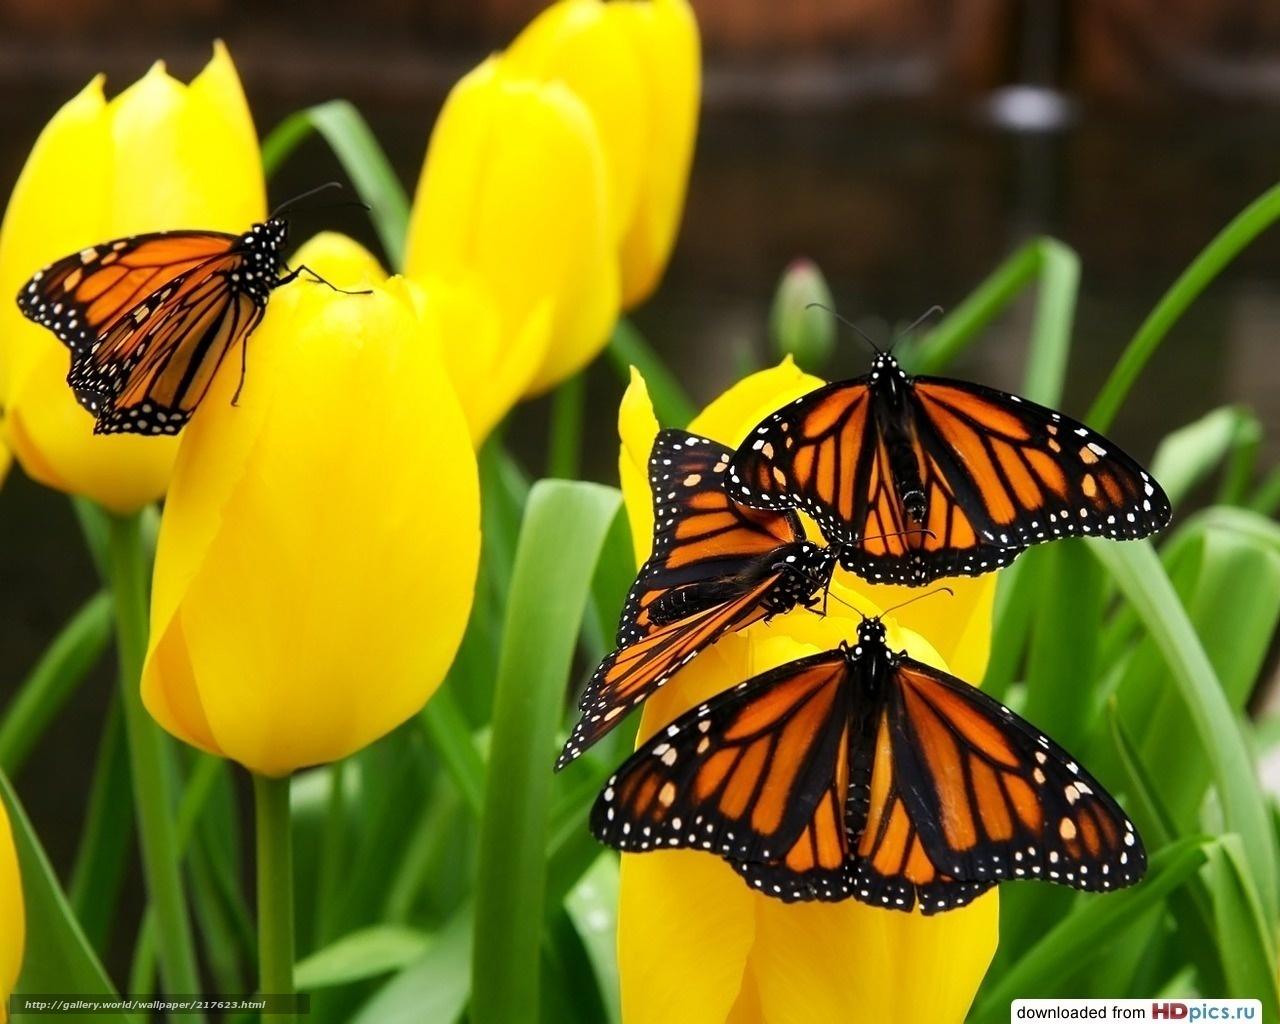 Желтые тюльпаны цветы насекомые